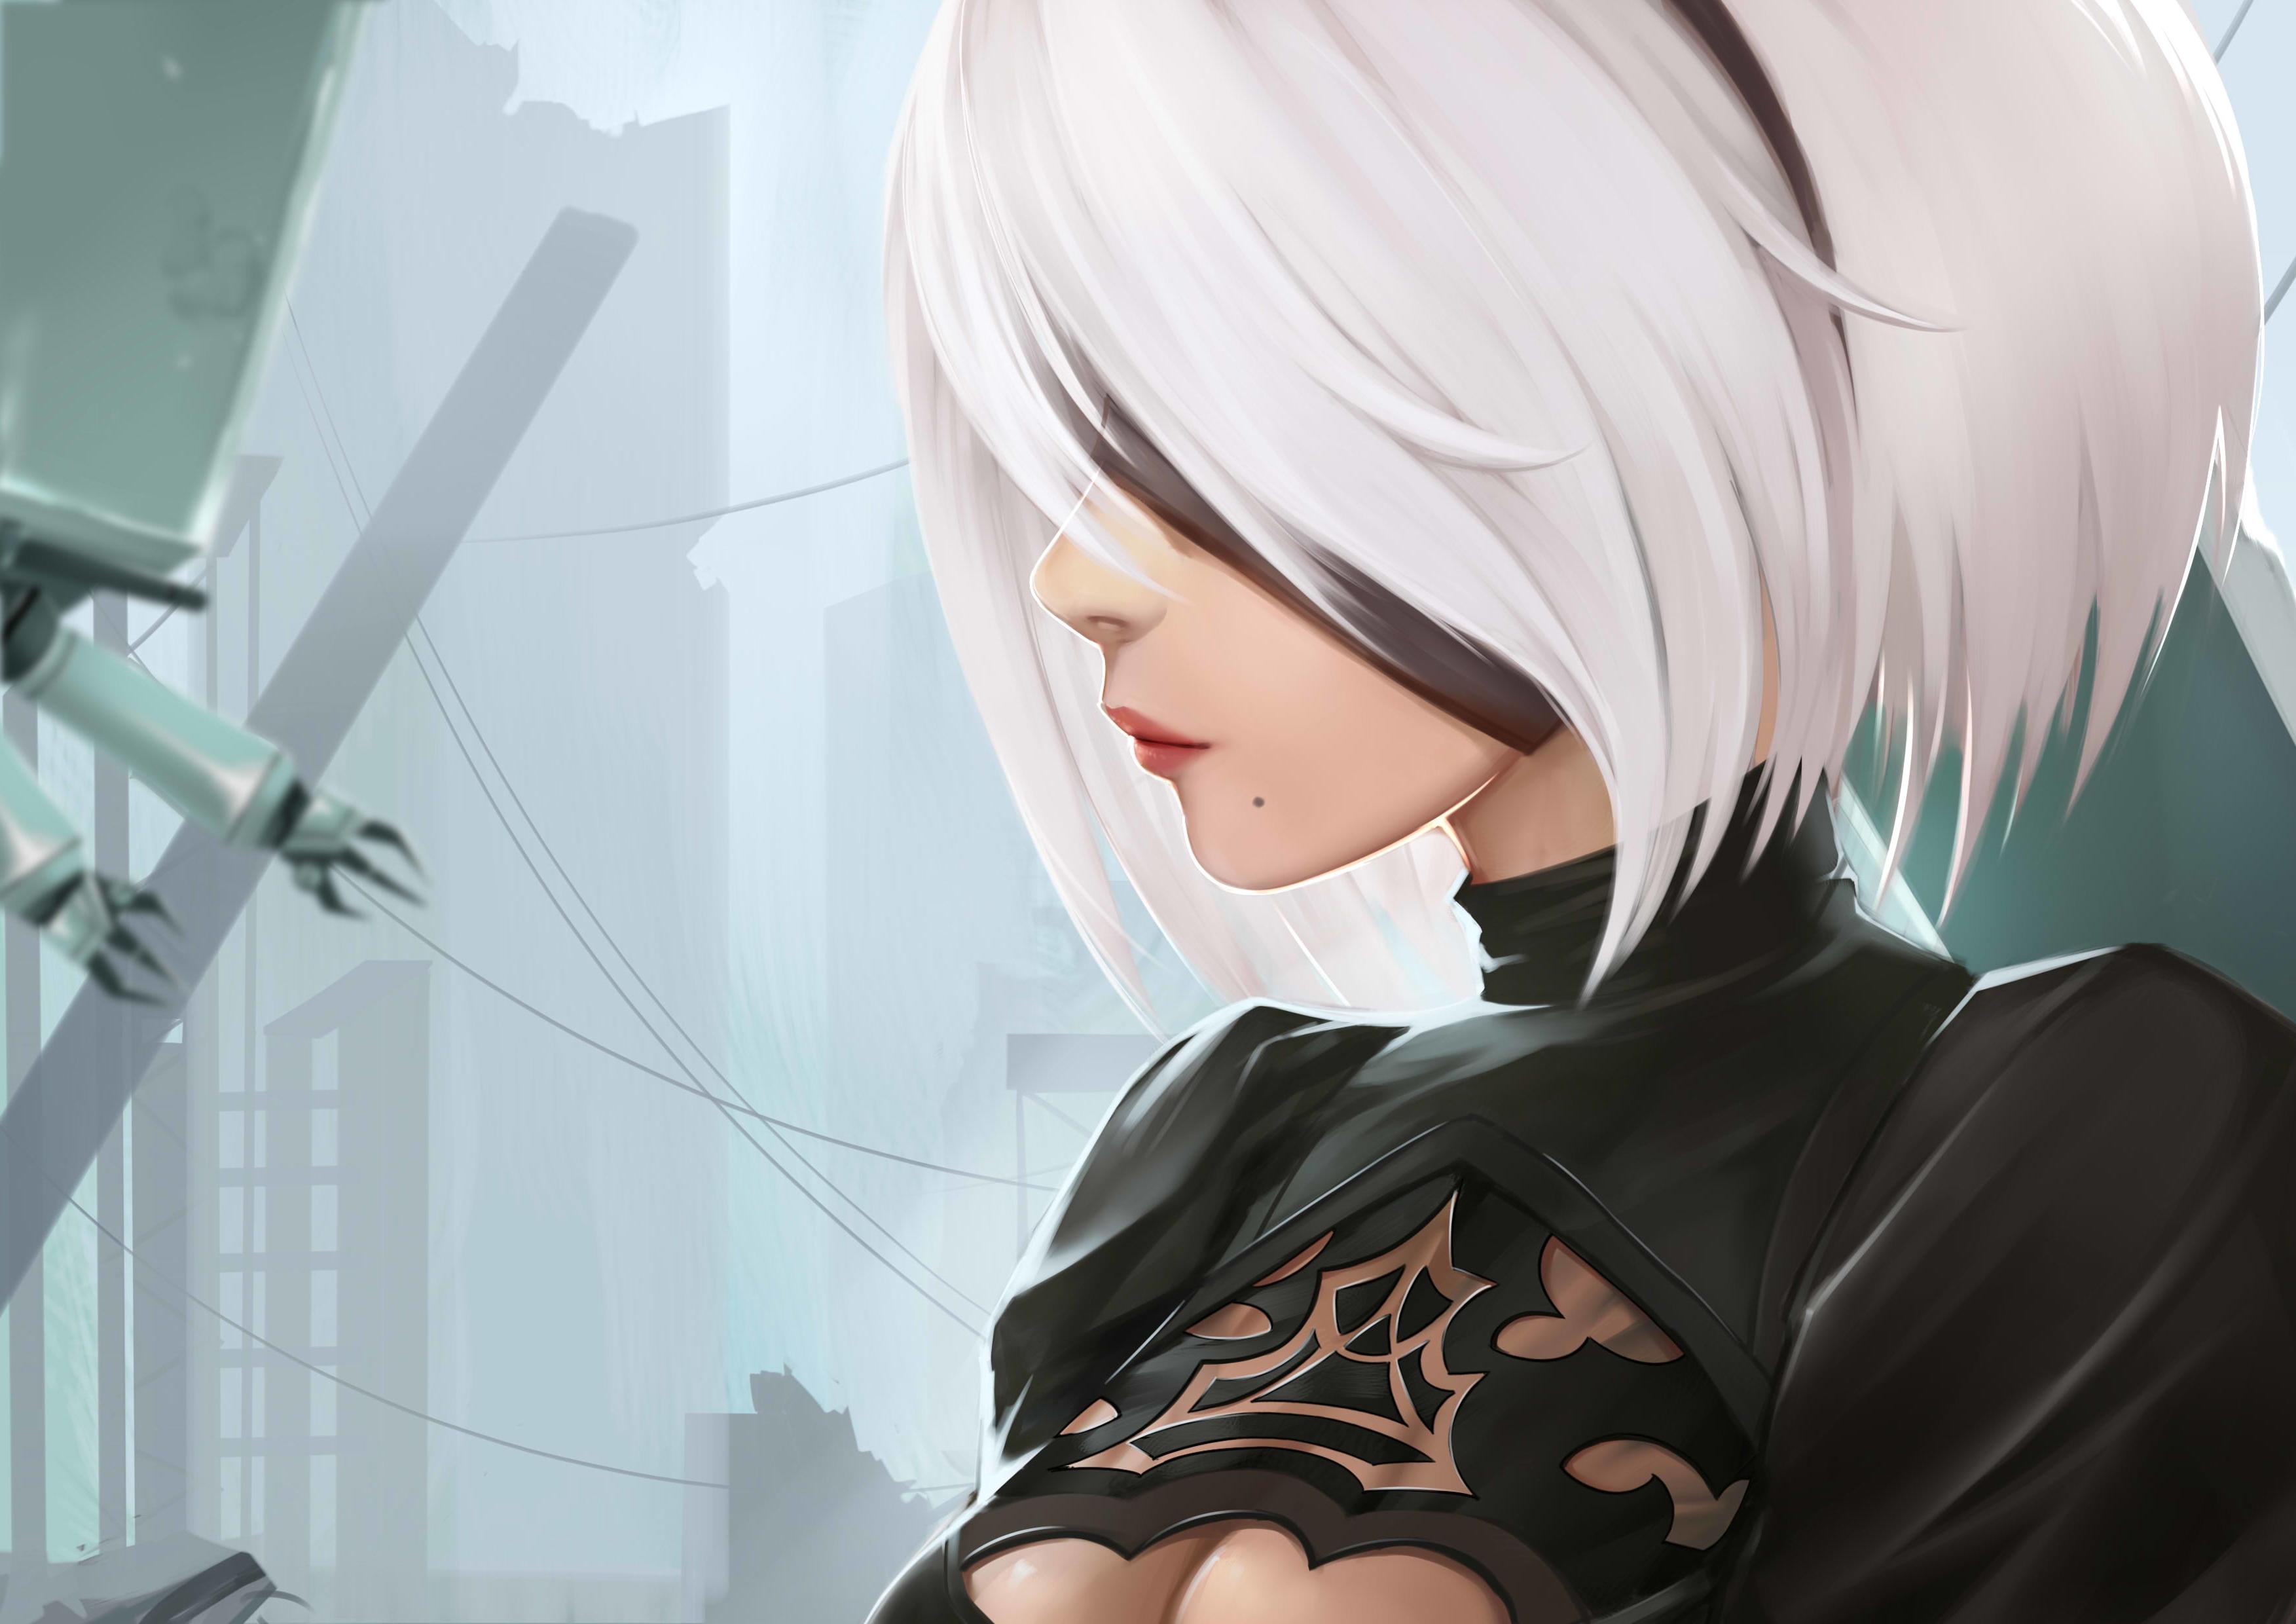 Anime 3507x2480 2B (Nier: Automata) Nier: Automata Yorha unit no.2 type b video games blindfold white hair short hair androids anime girls NieR